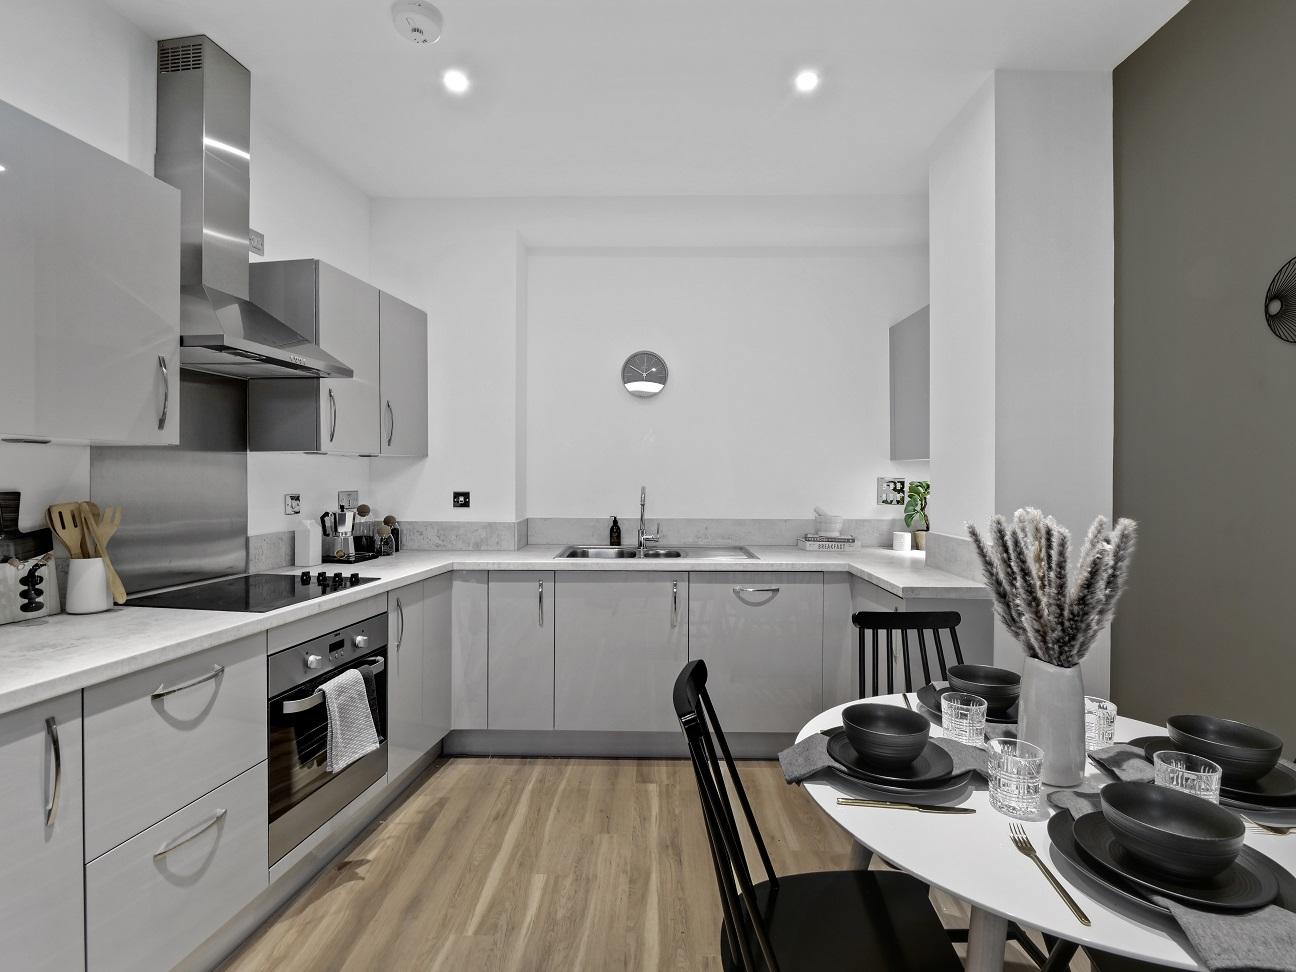 Oaklands Rise kitchen 2.jpg